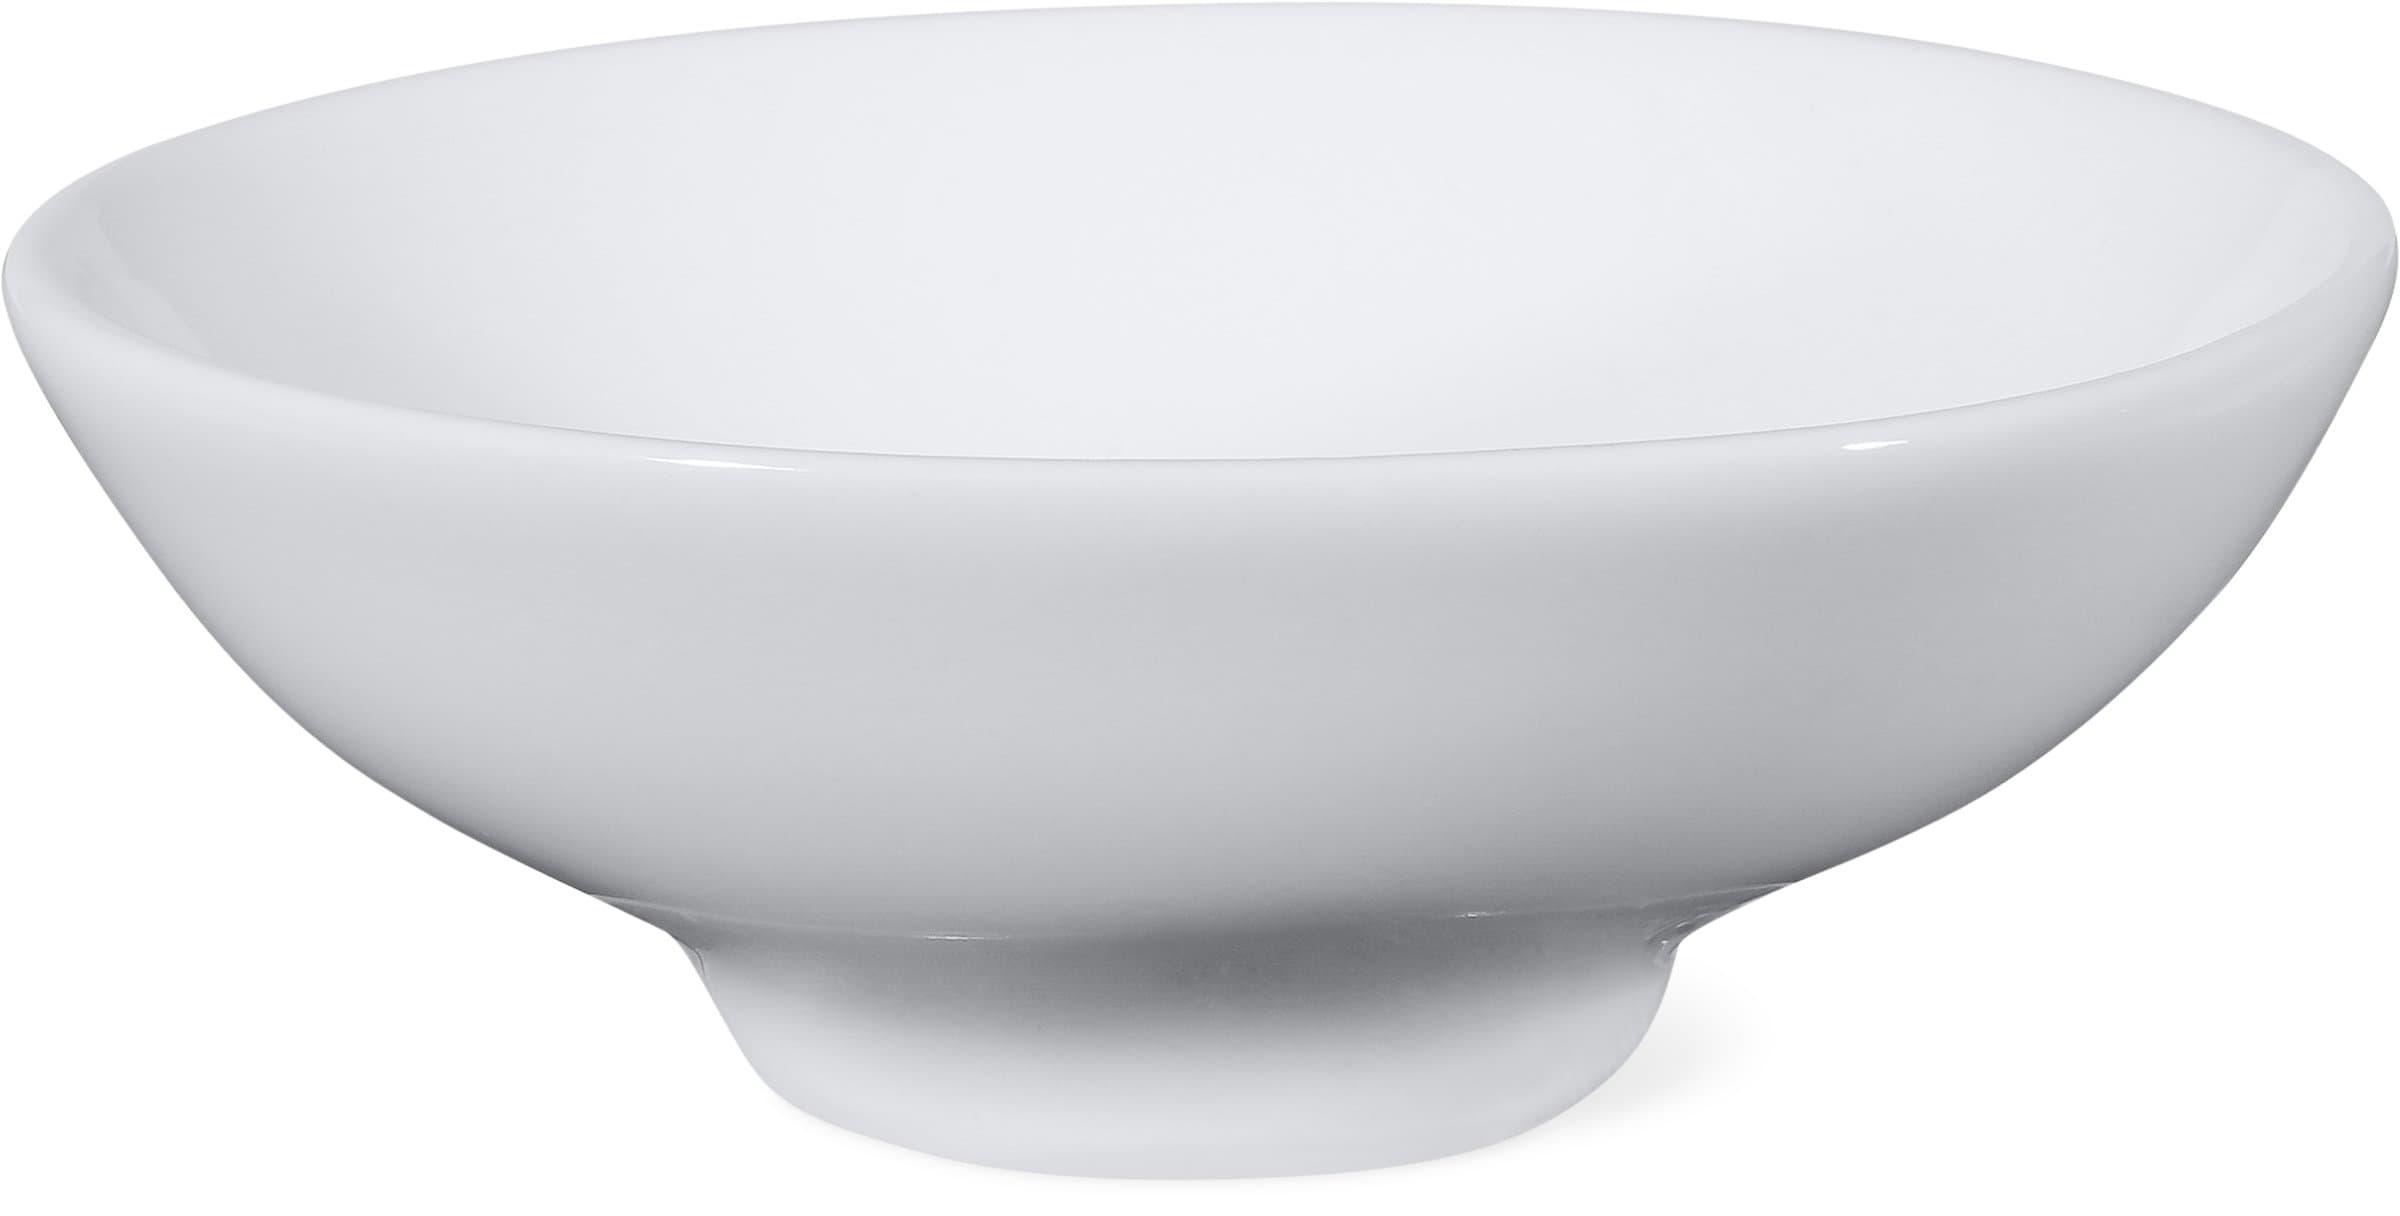 Cucina & Tavola PURE Schale 9.5x8cm